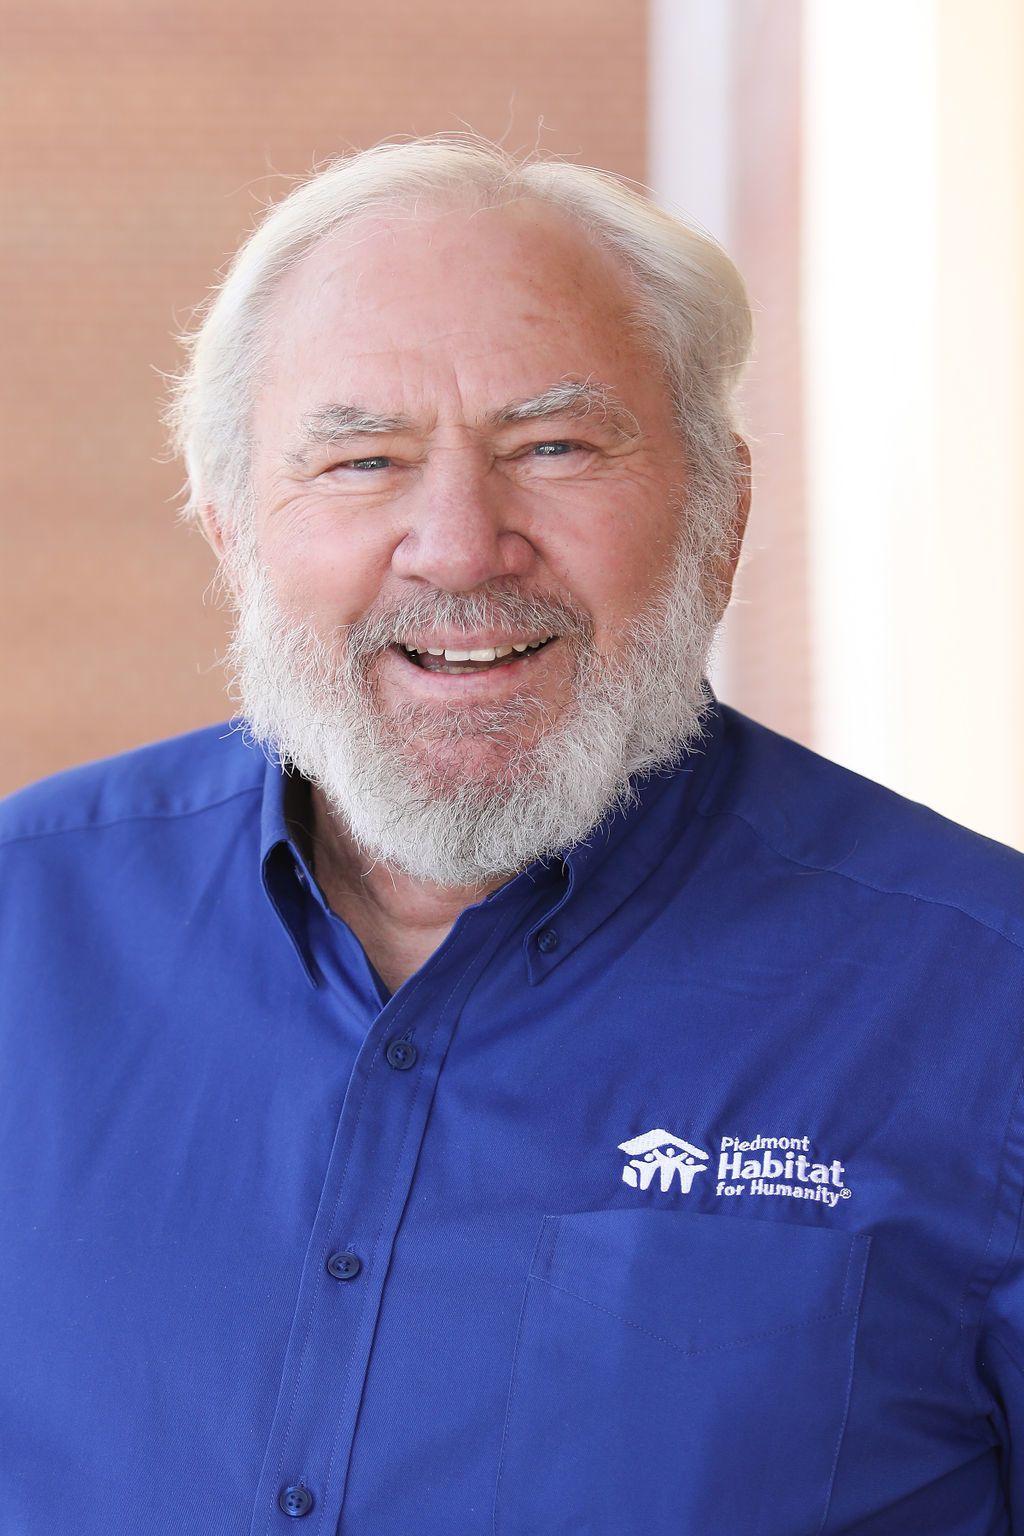 Dennis Burley